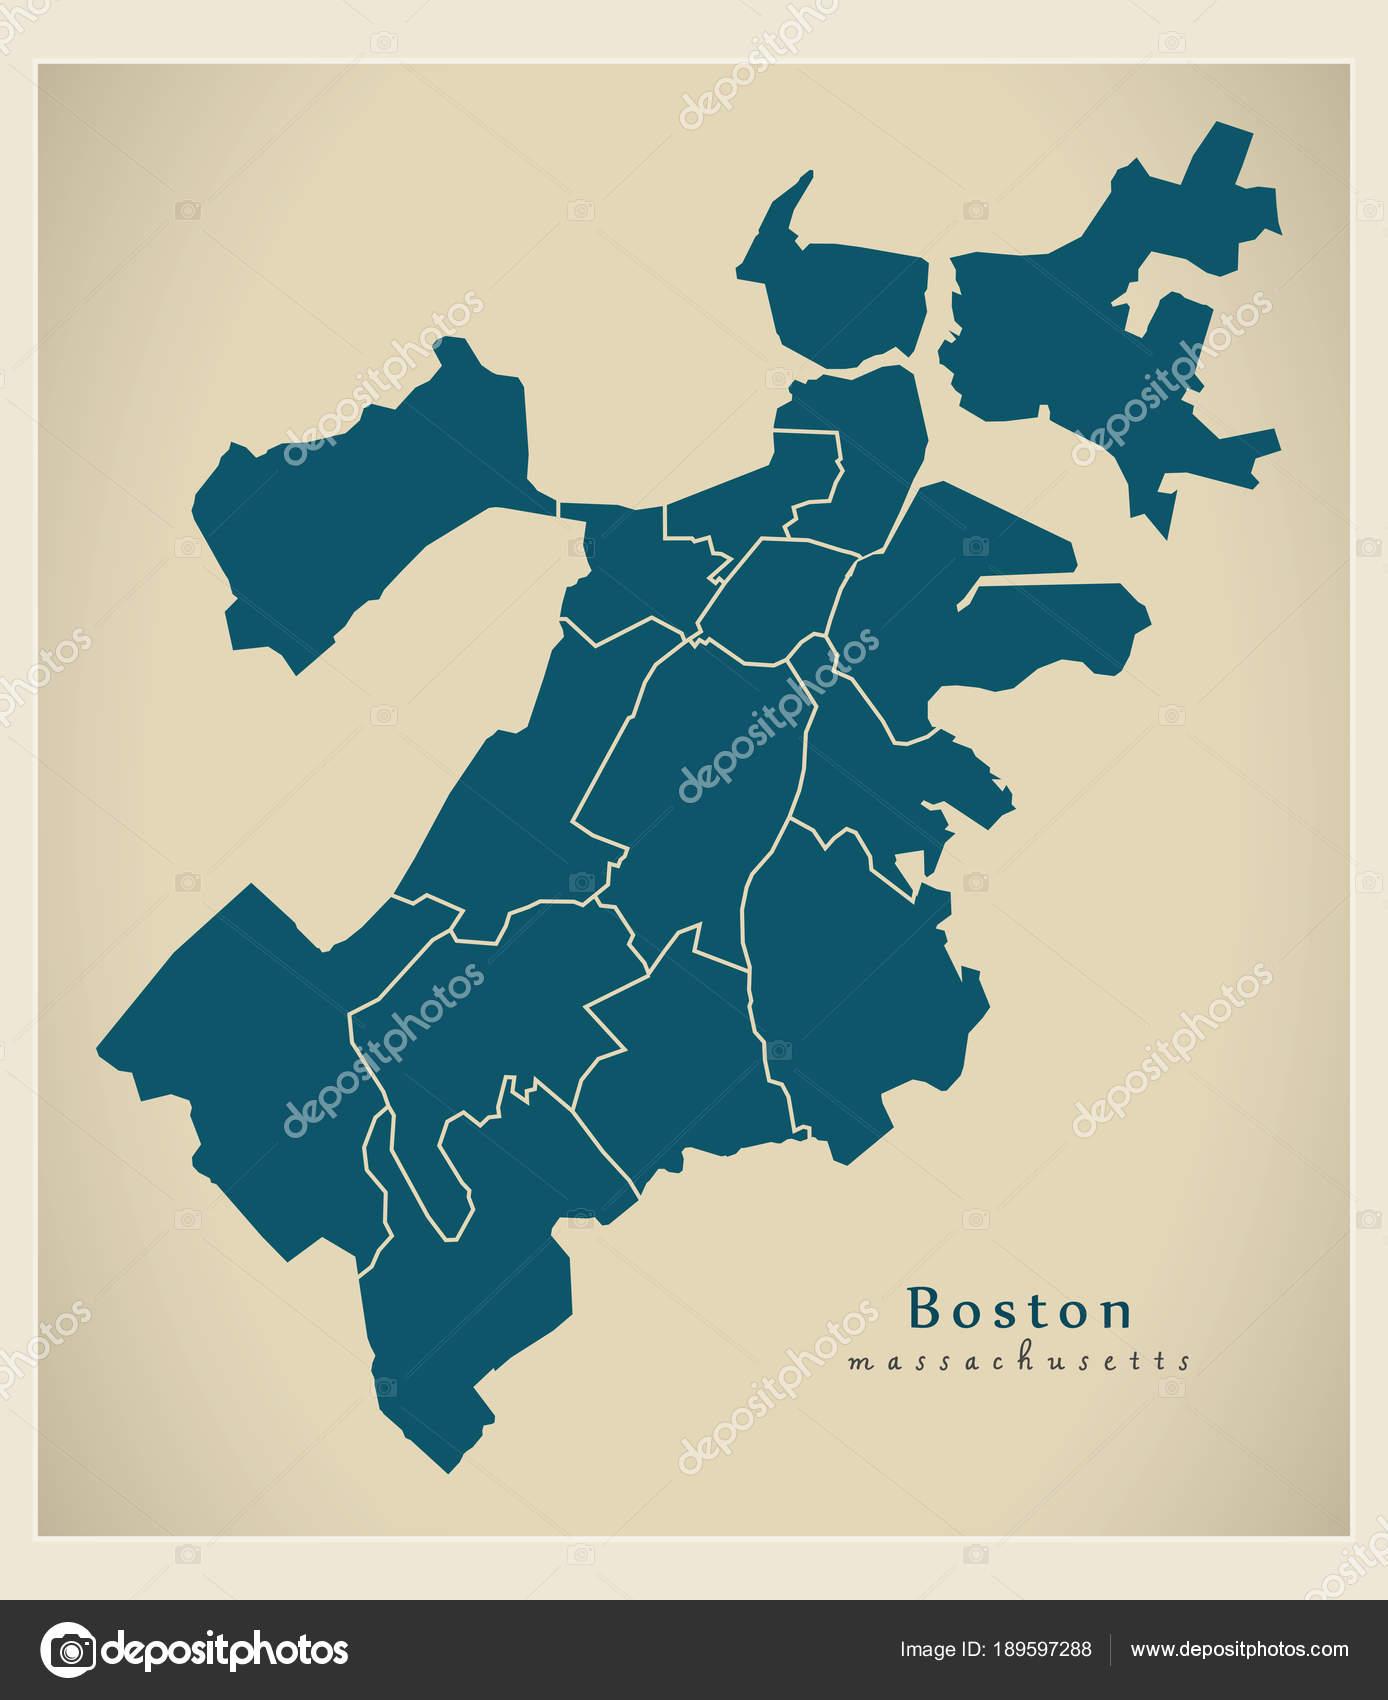 Moderne City Map - Boston, Massachusetts Stadt der Usa mit Bezirken ...